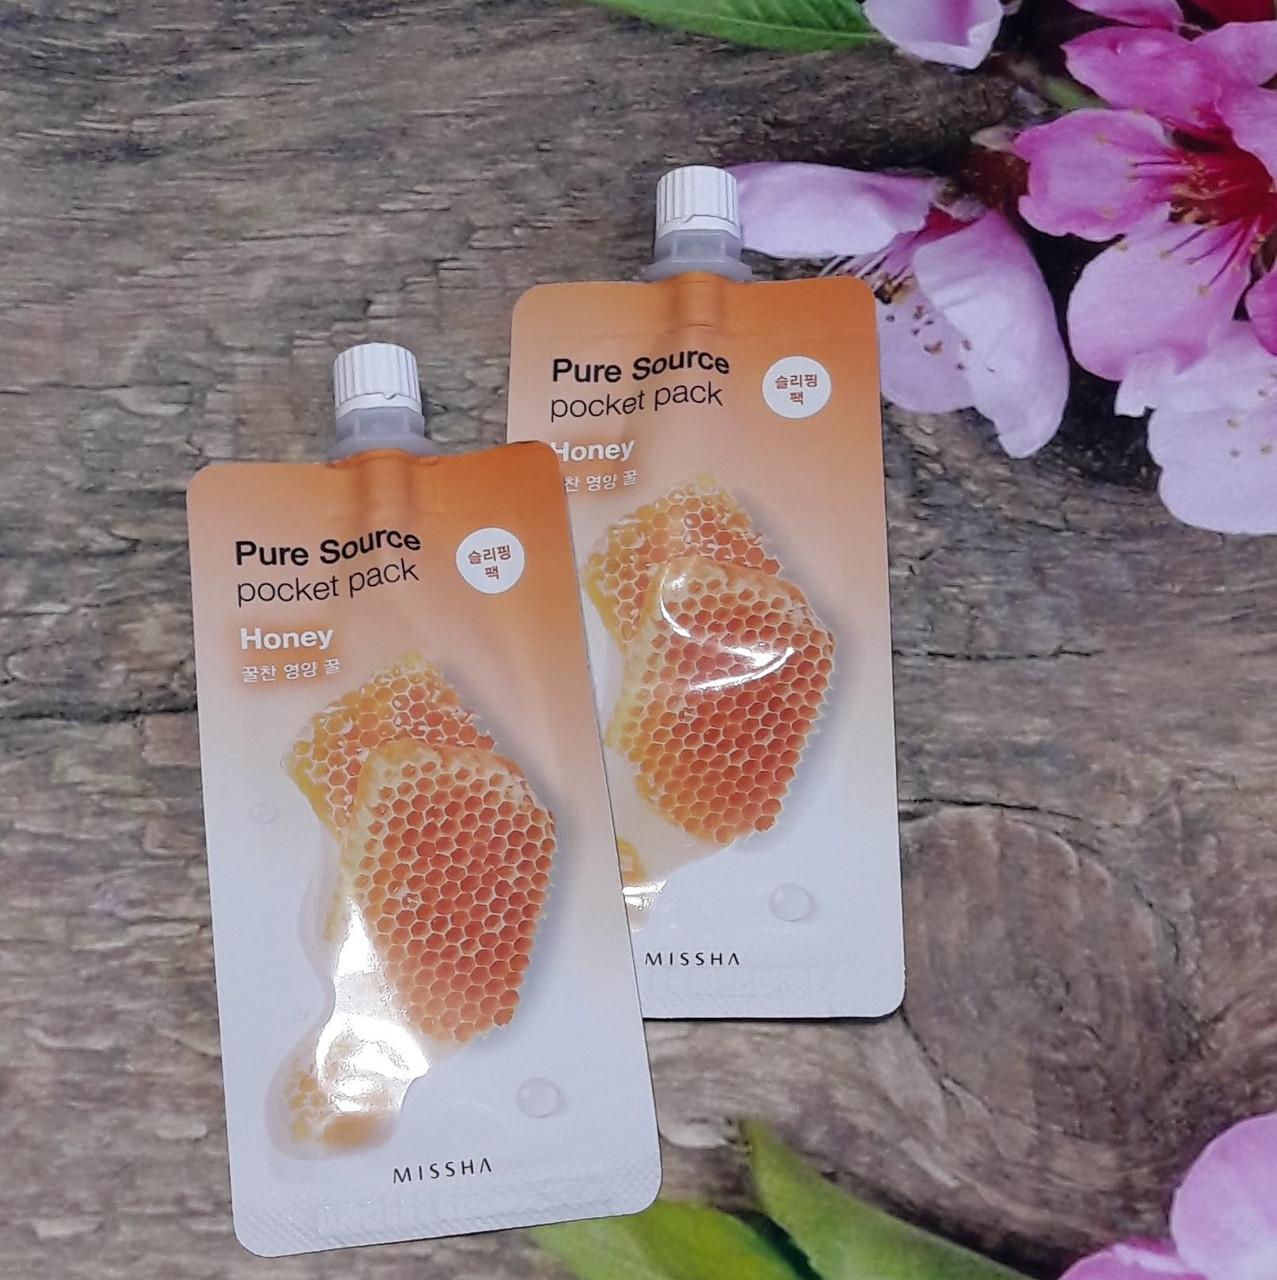 Ночная маска с экстрактом меда Missha Pure Source Pocket Pack Honey